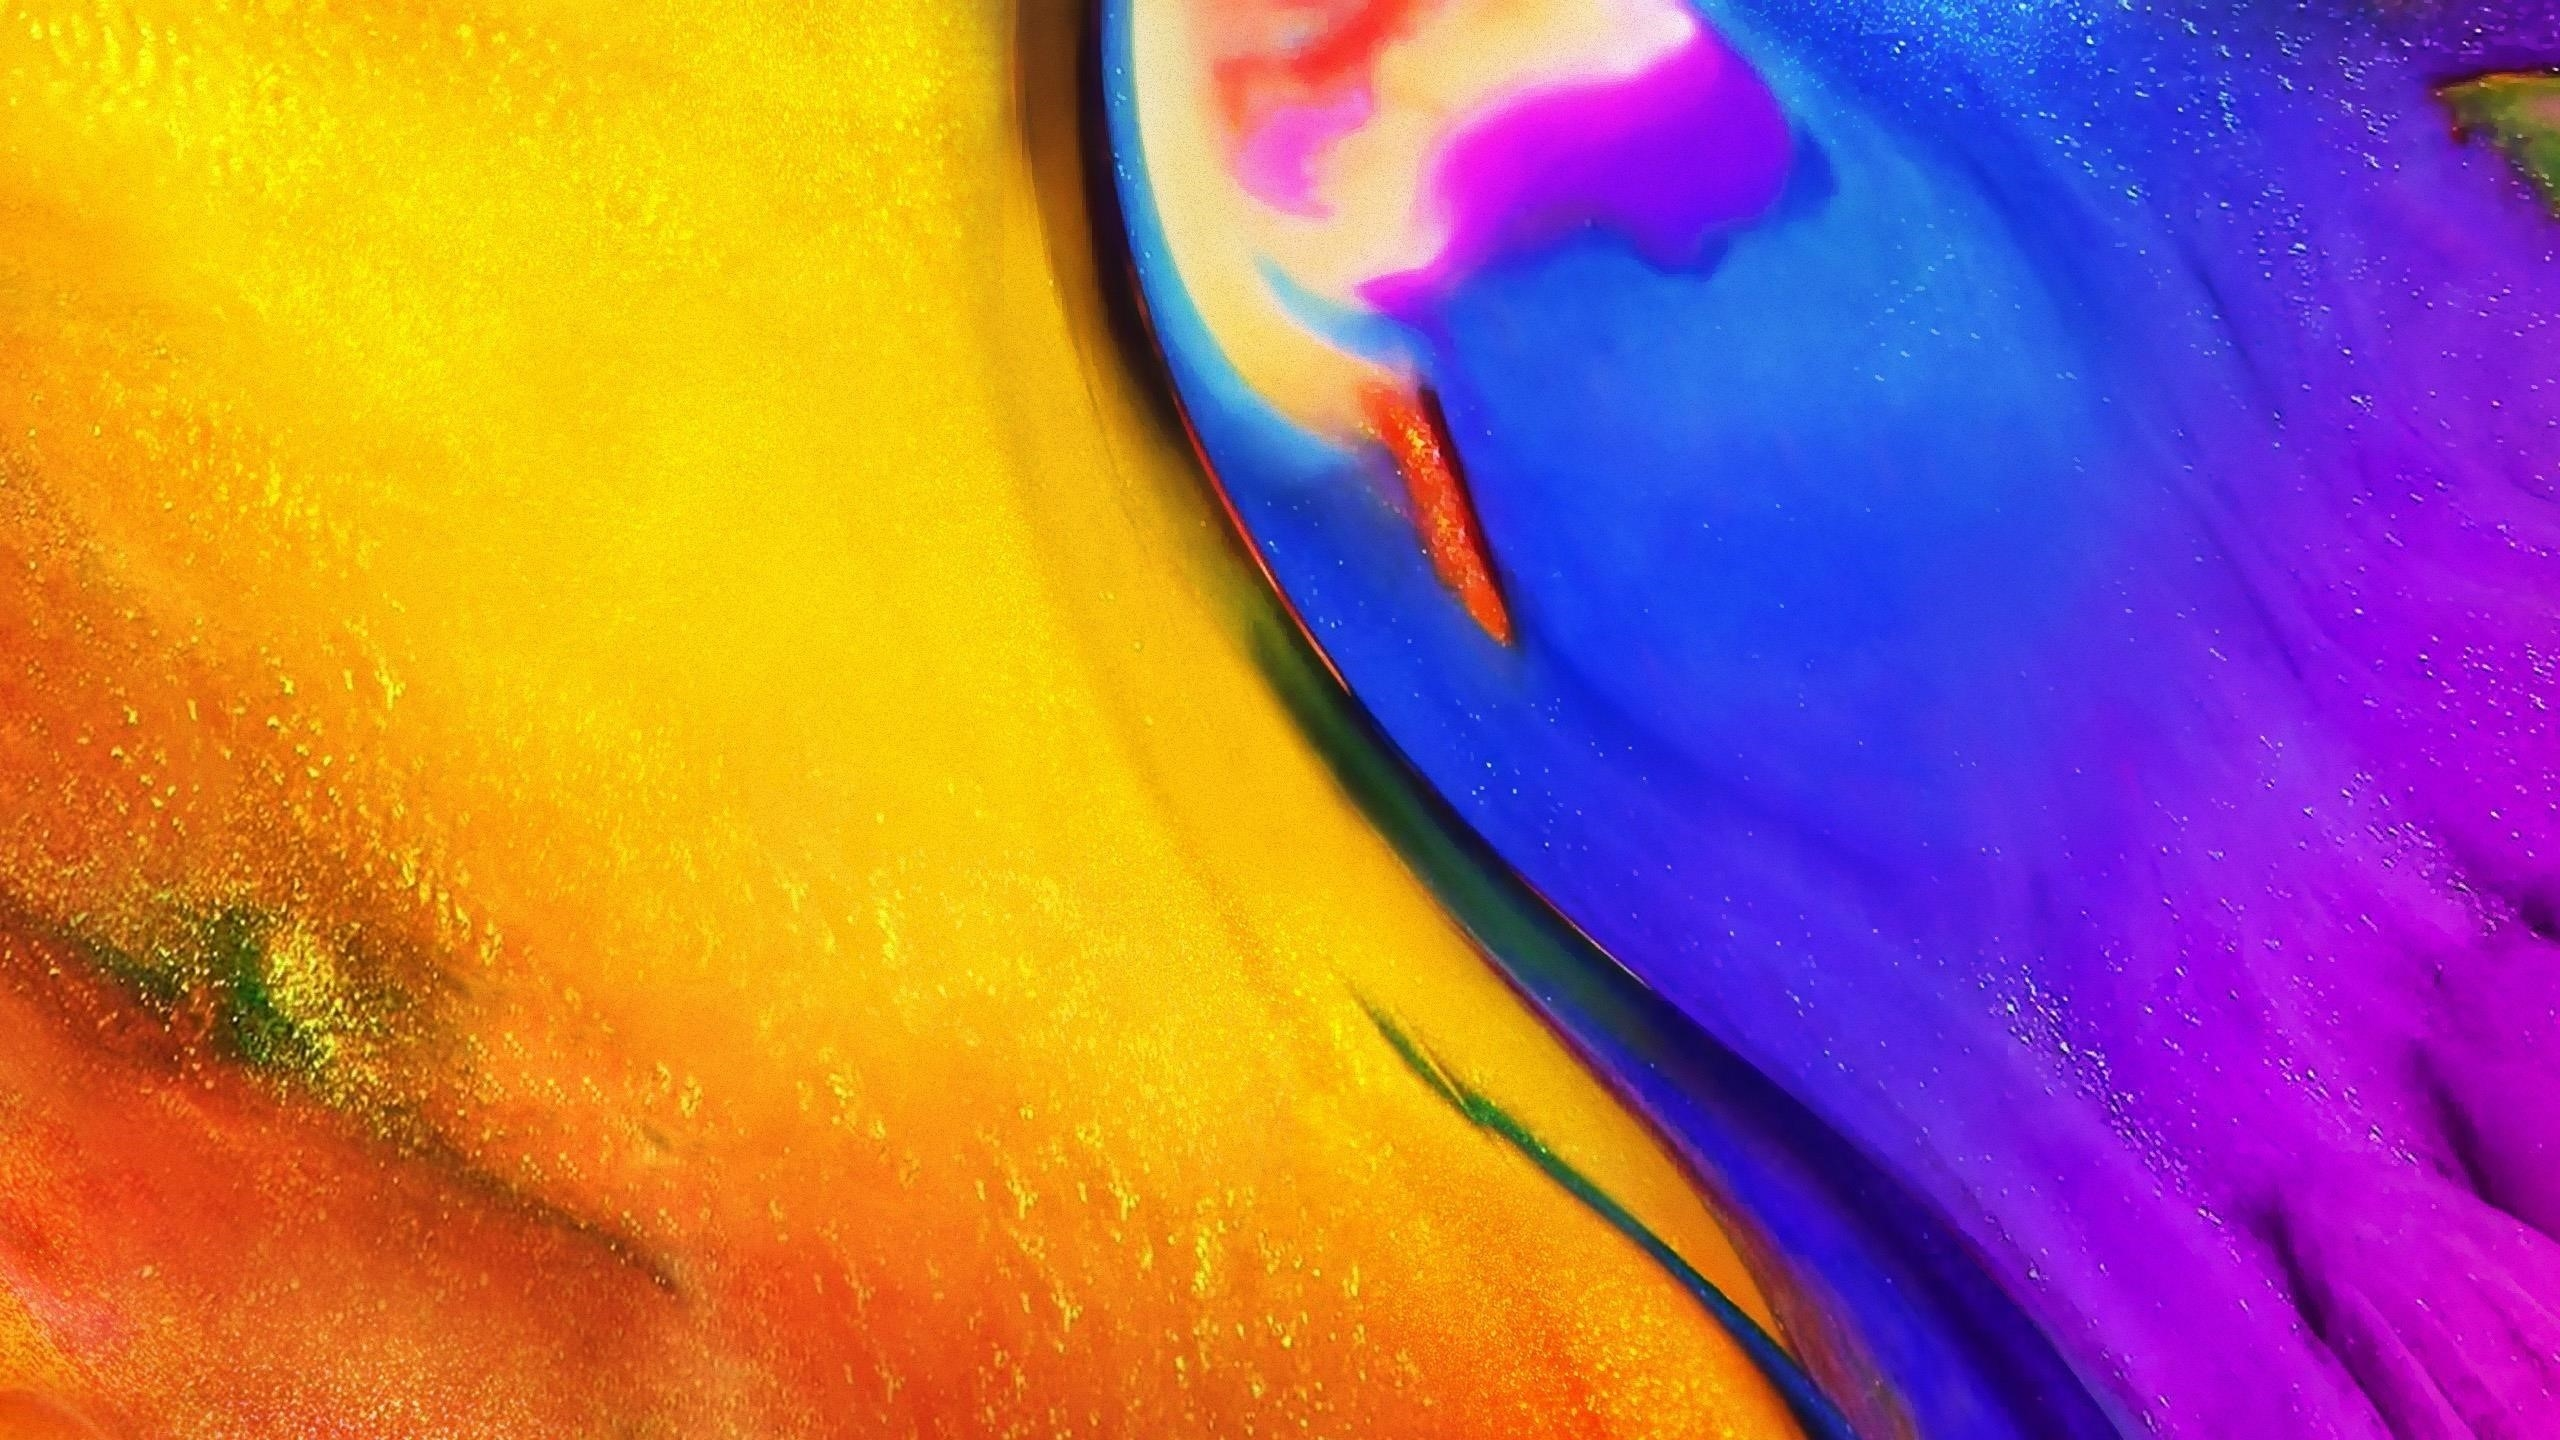 Colorful abstract lg v35 thinq v35 обои скачать